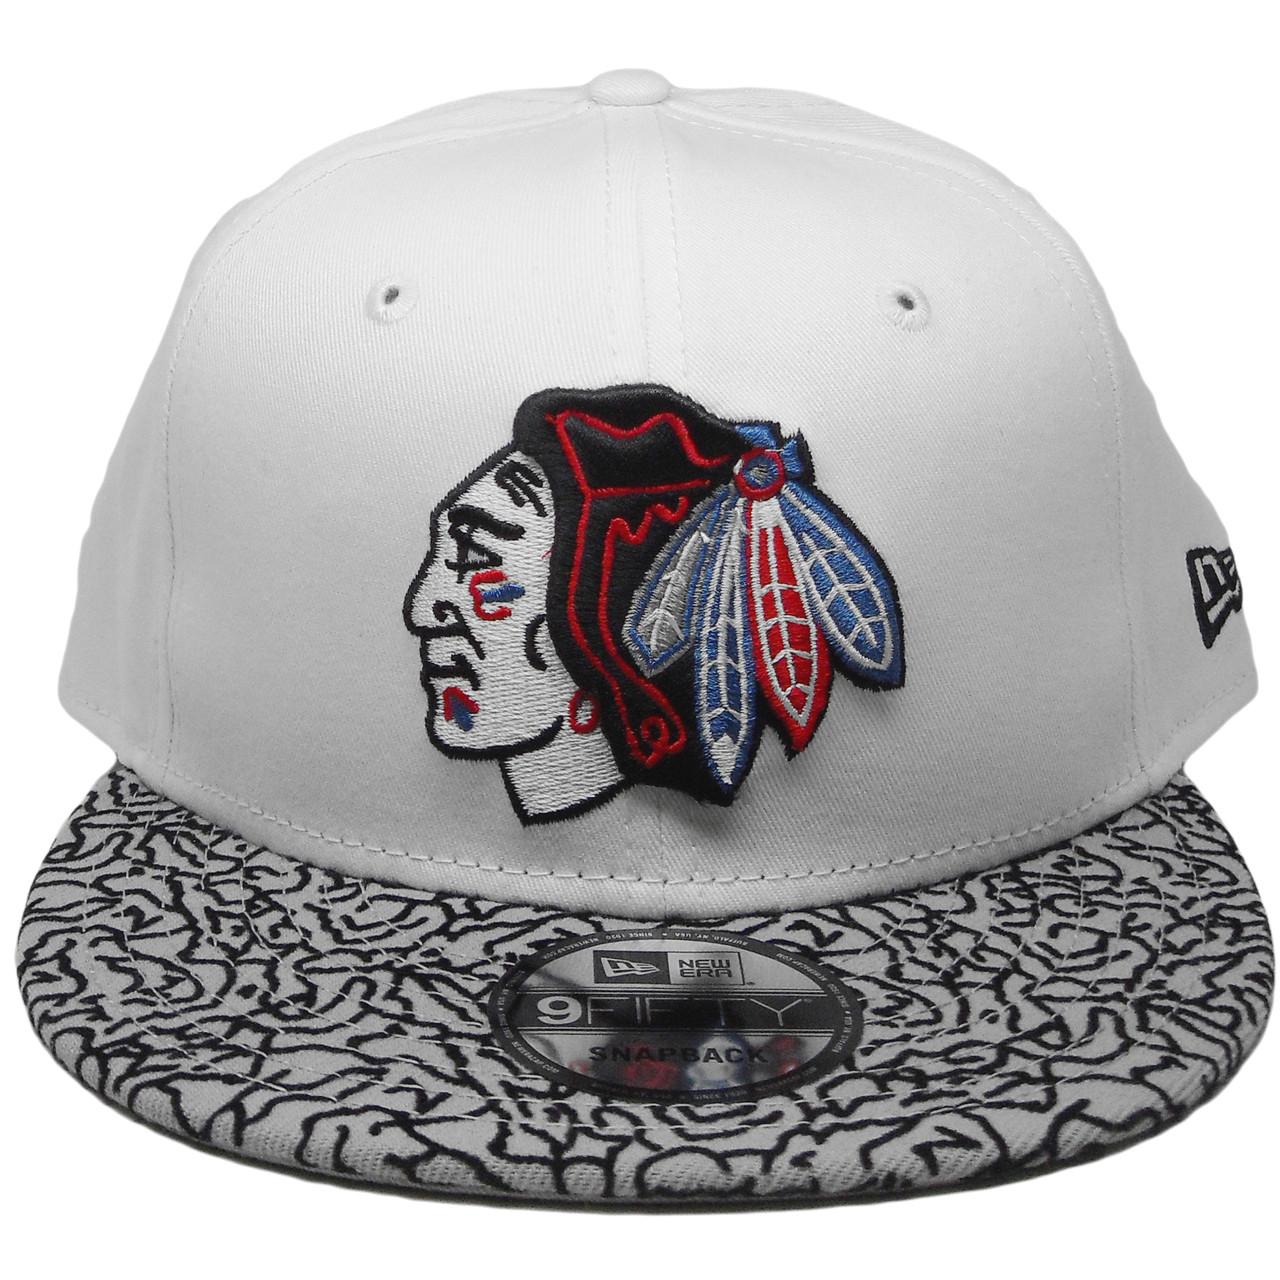 8939001b65e Chicago Blackhawks New Era 9Fity Custom Snapback Hat - White